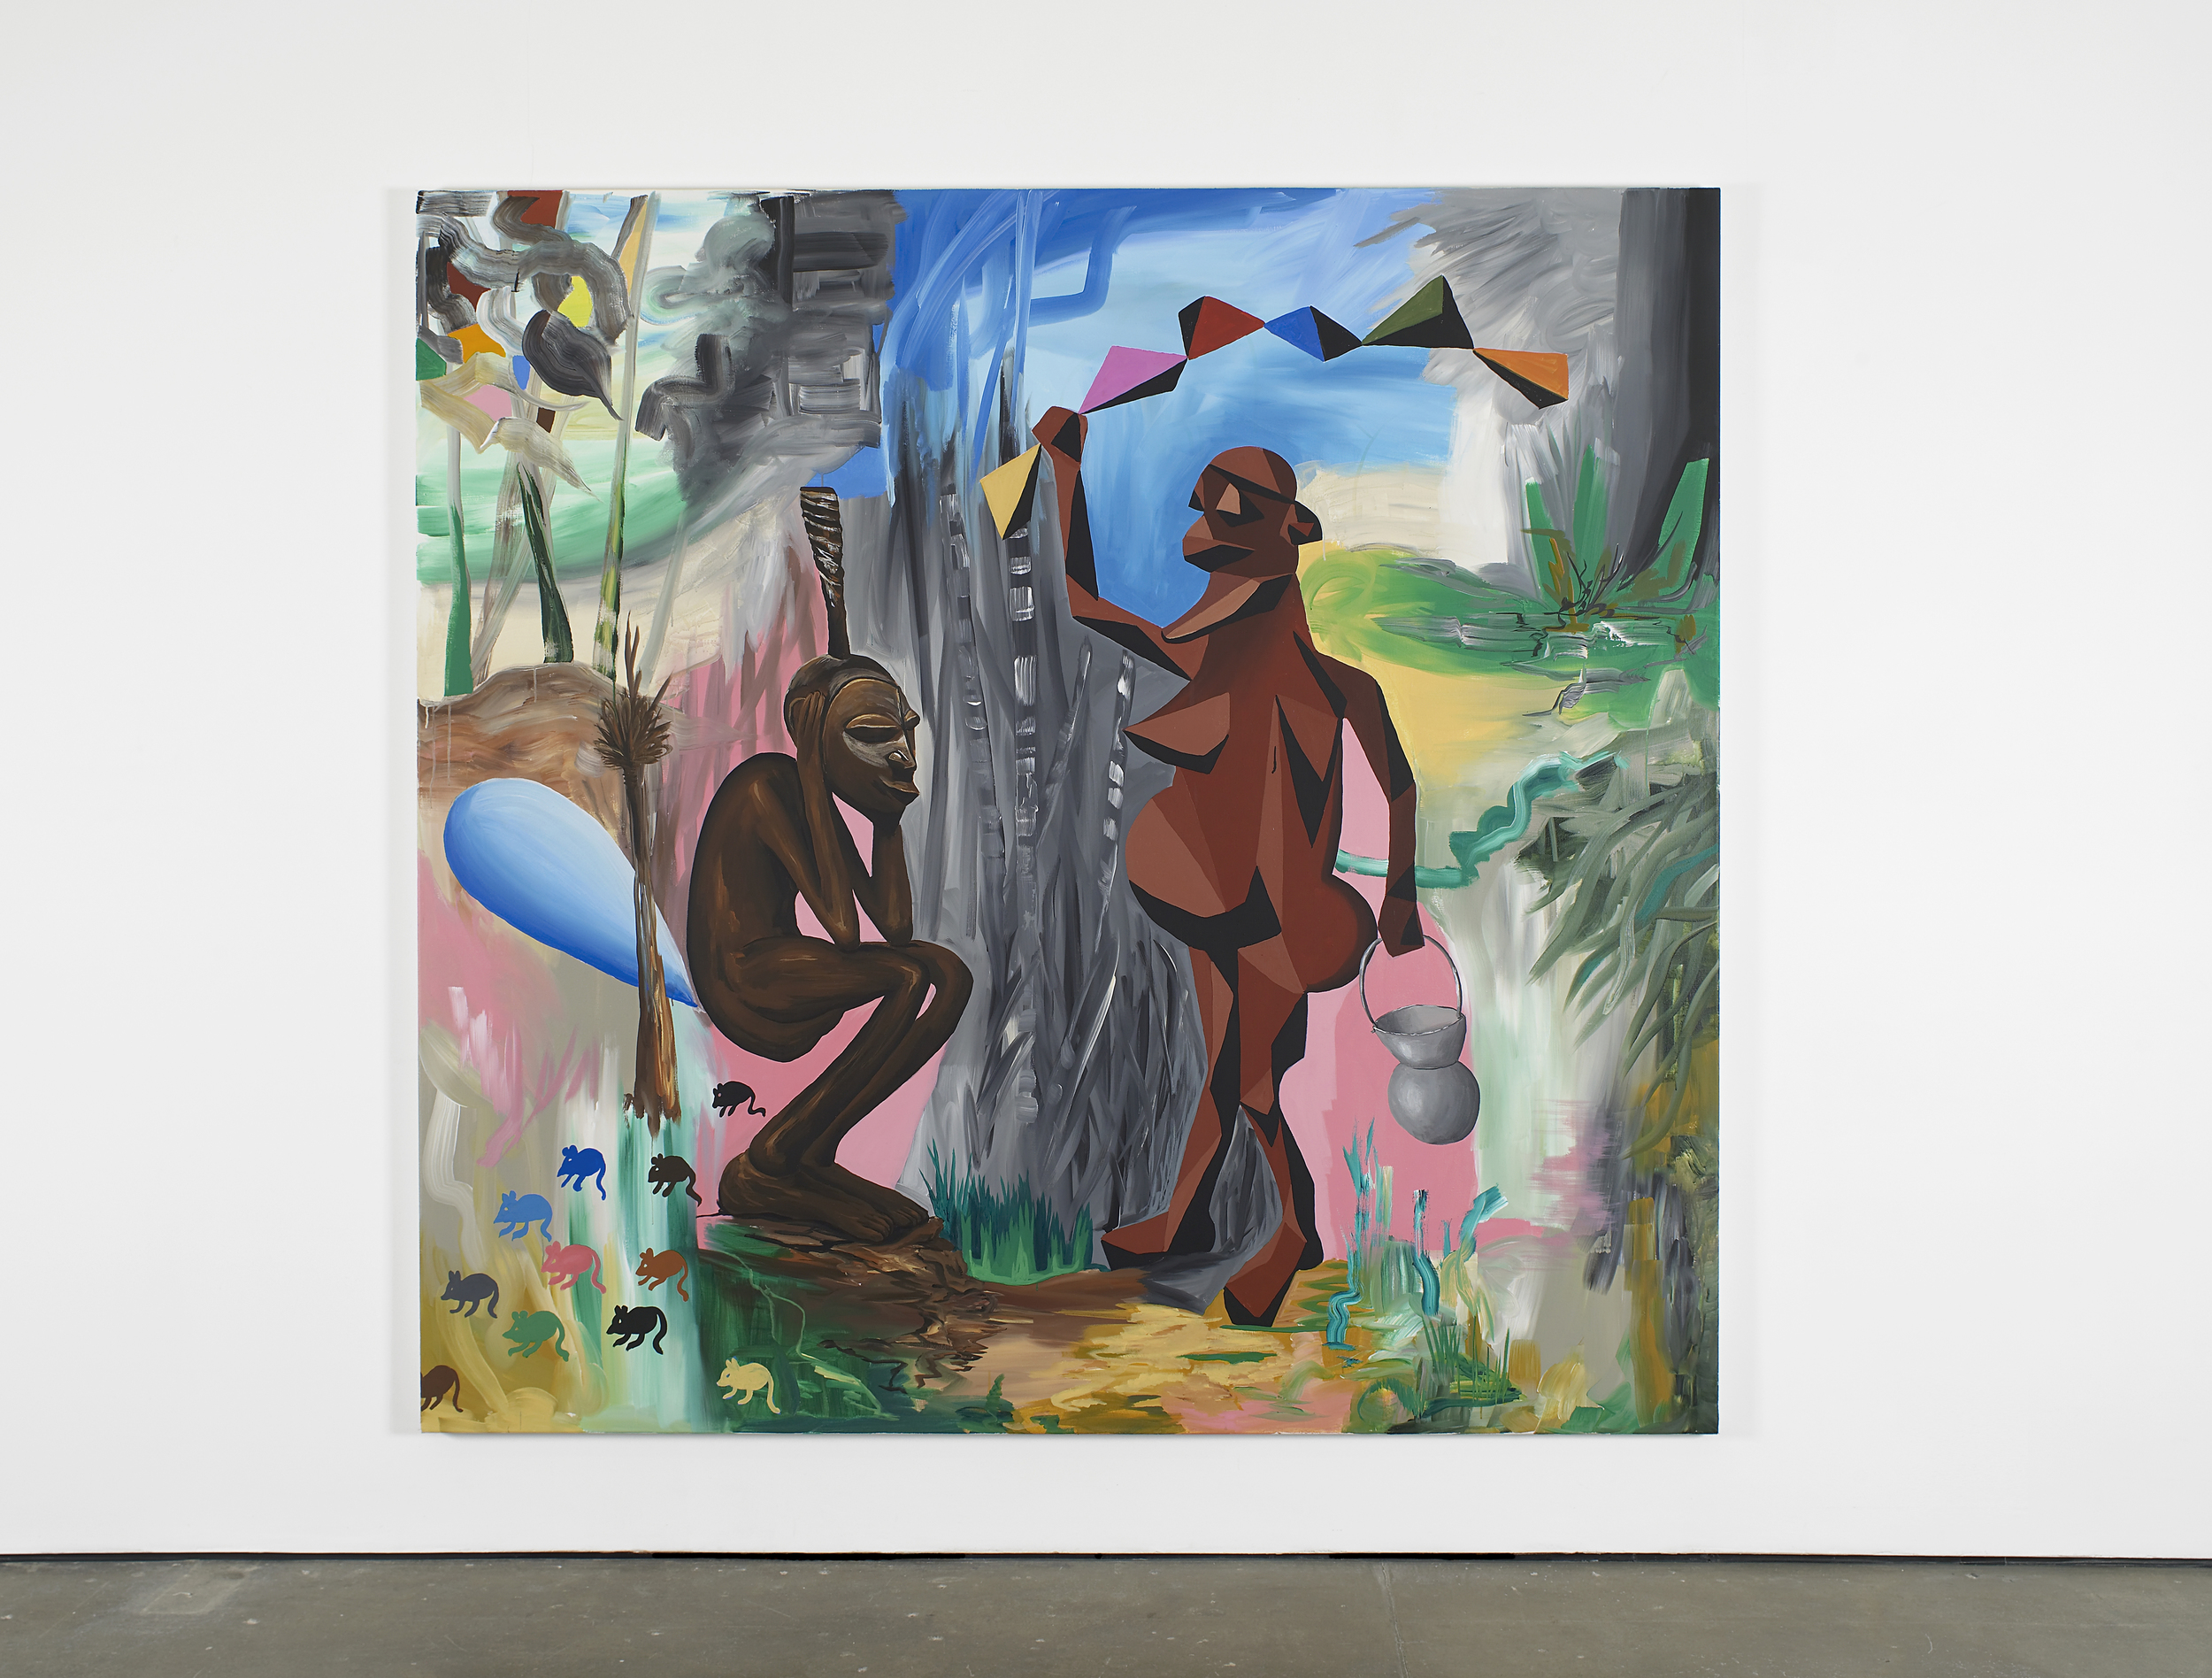 Papa don't Preach 2014 Acrylic on canvas 225 x 235 cm / 88.5 x 92.5 in